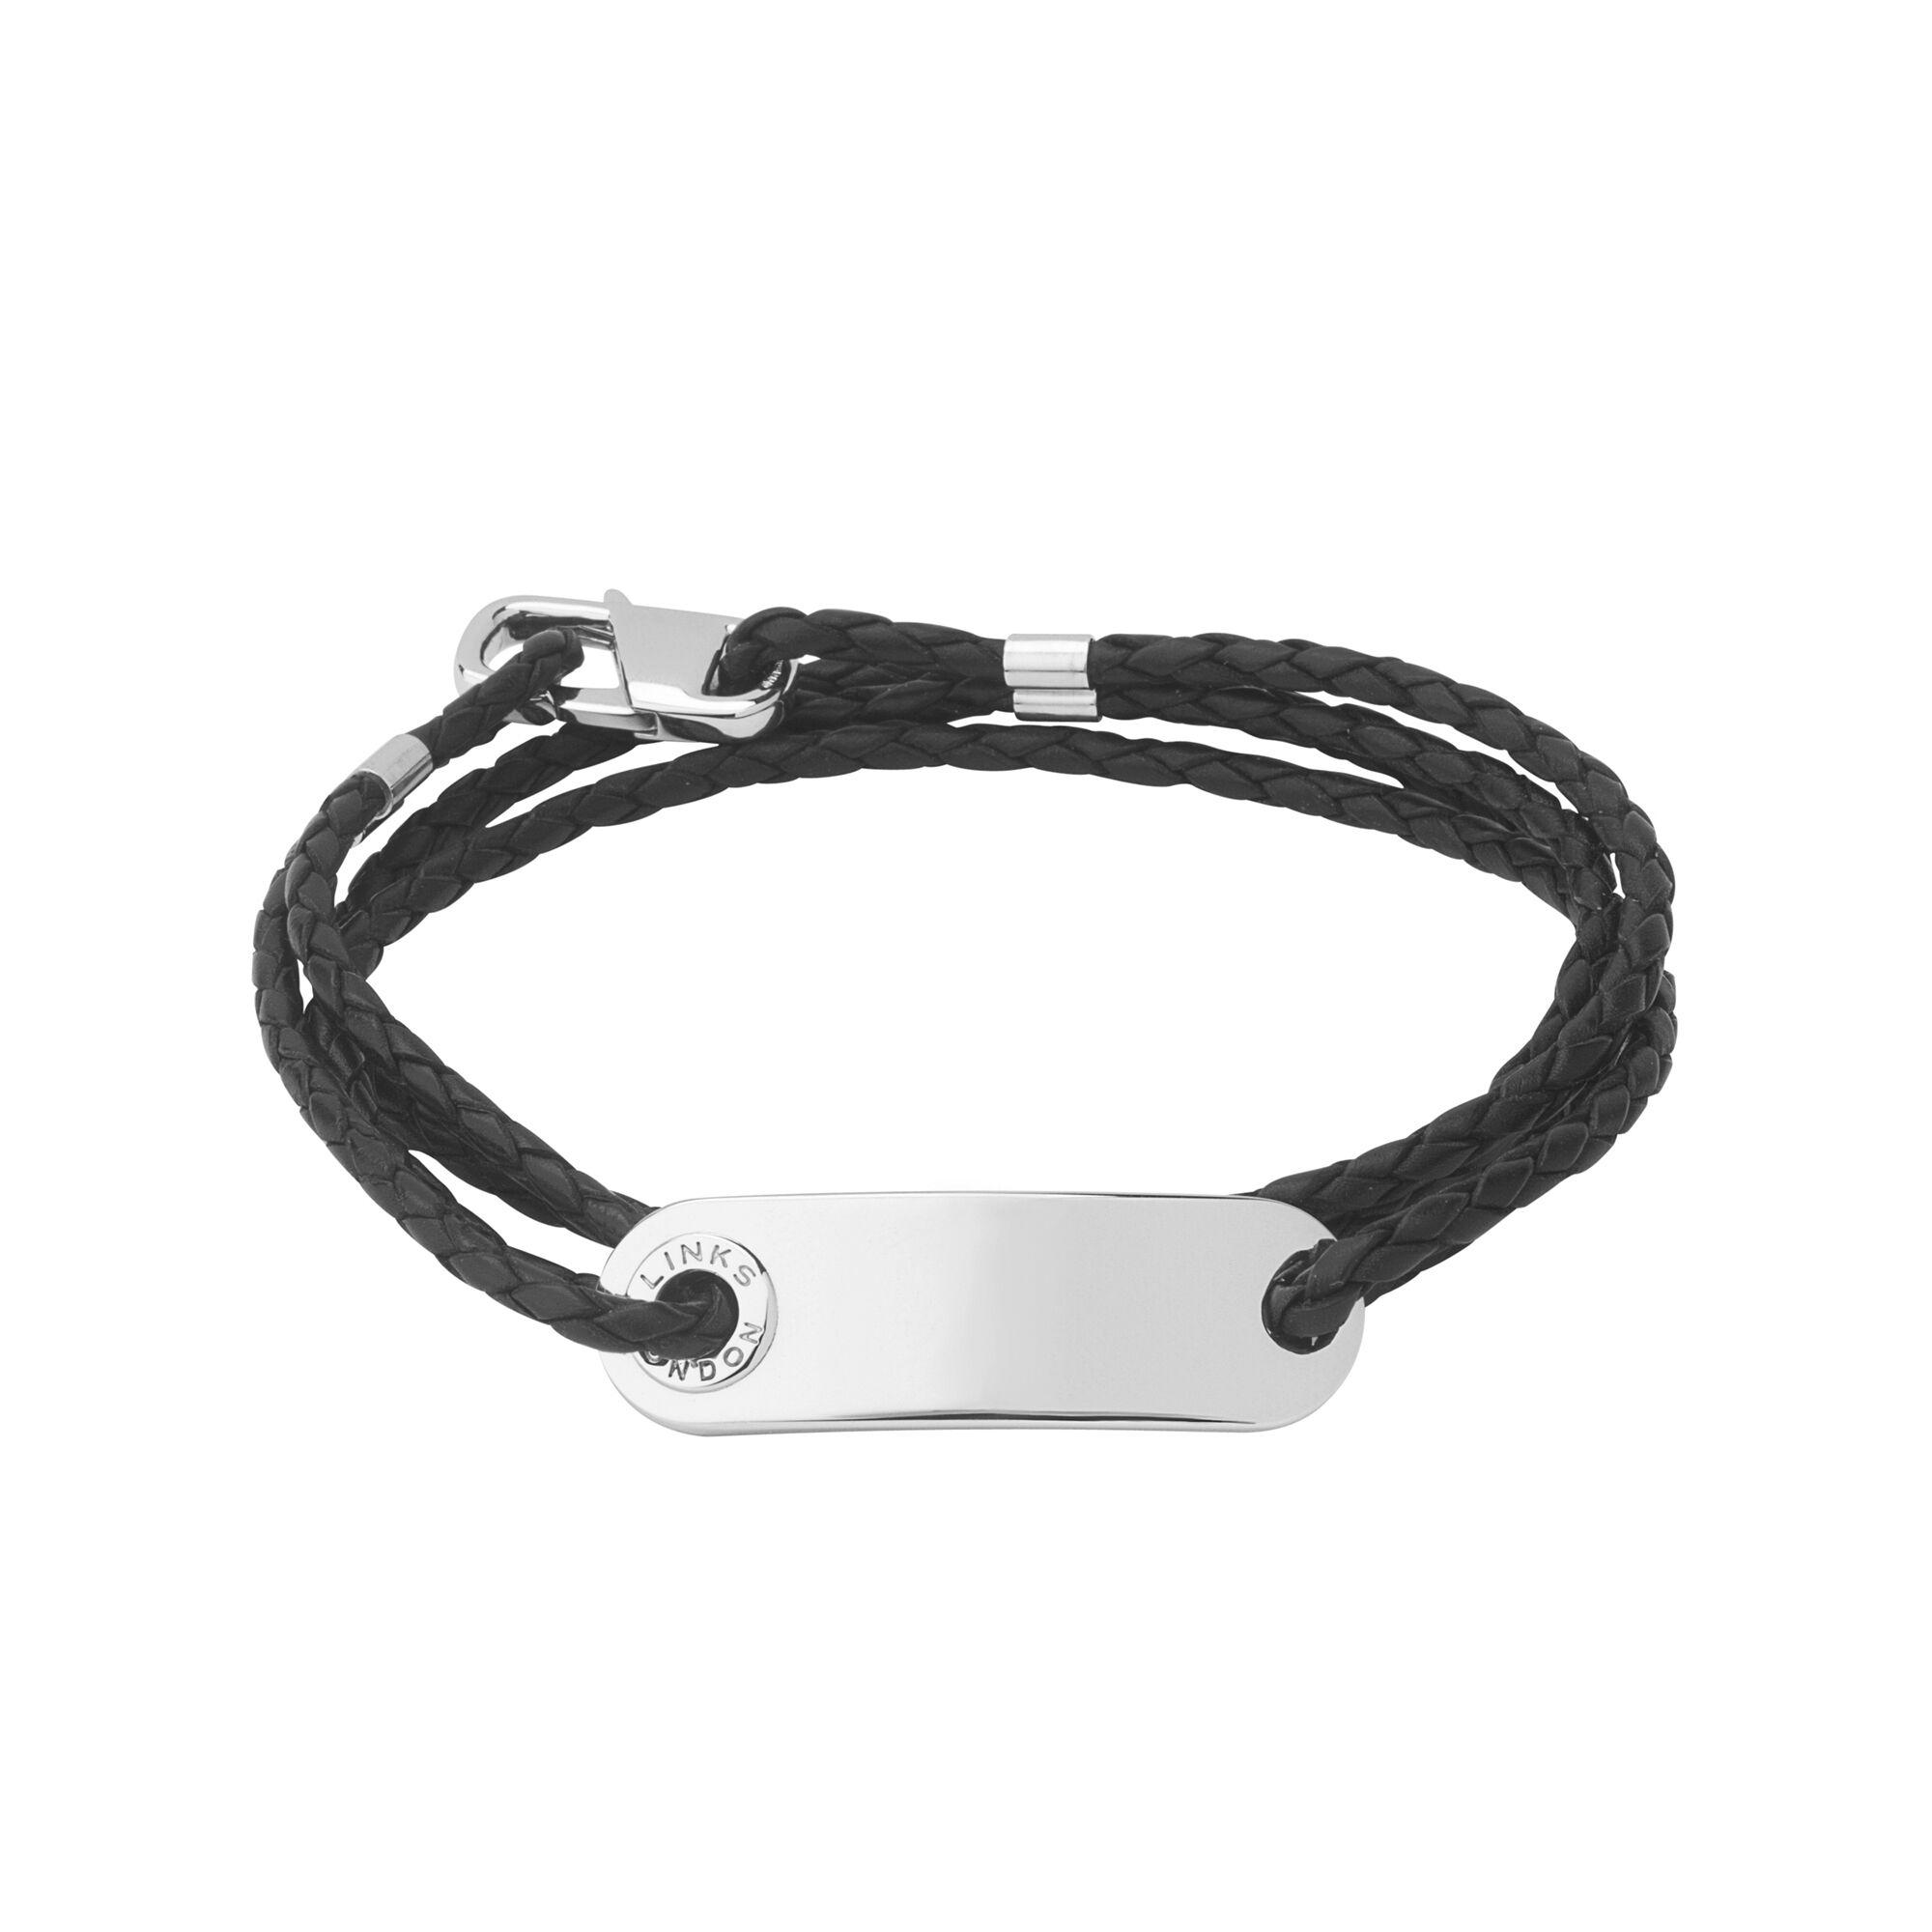 Venture mens black leather bracelet men bracelets links of london - Soho Mens Id Bracelet With Leather Cord Hires